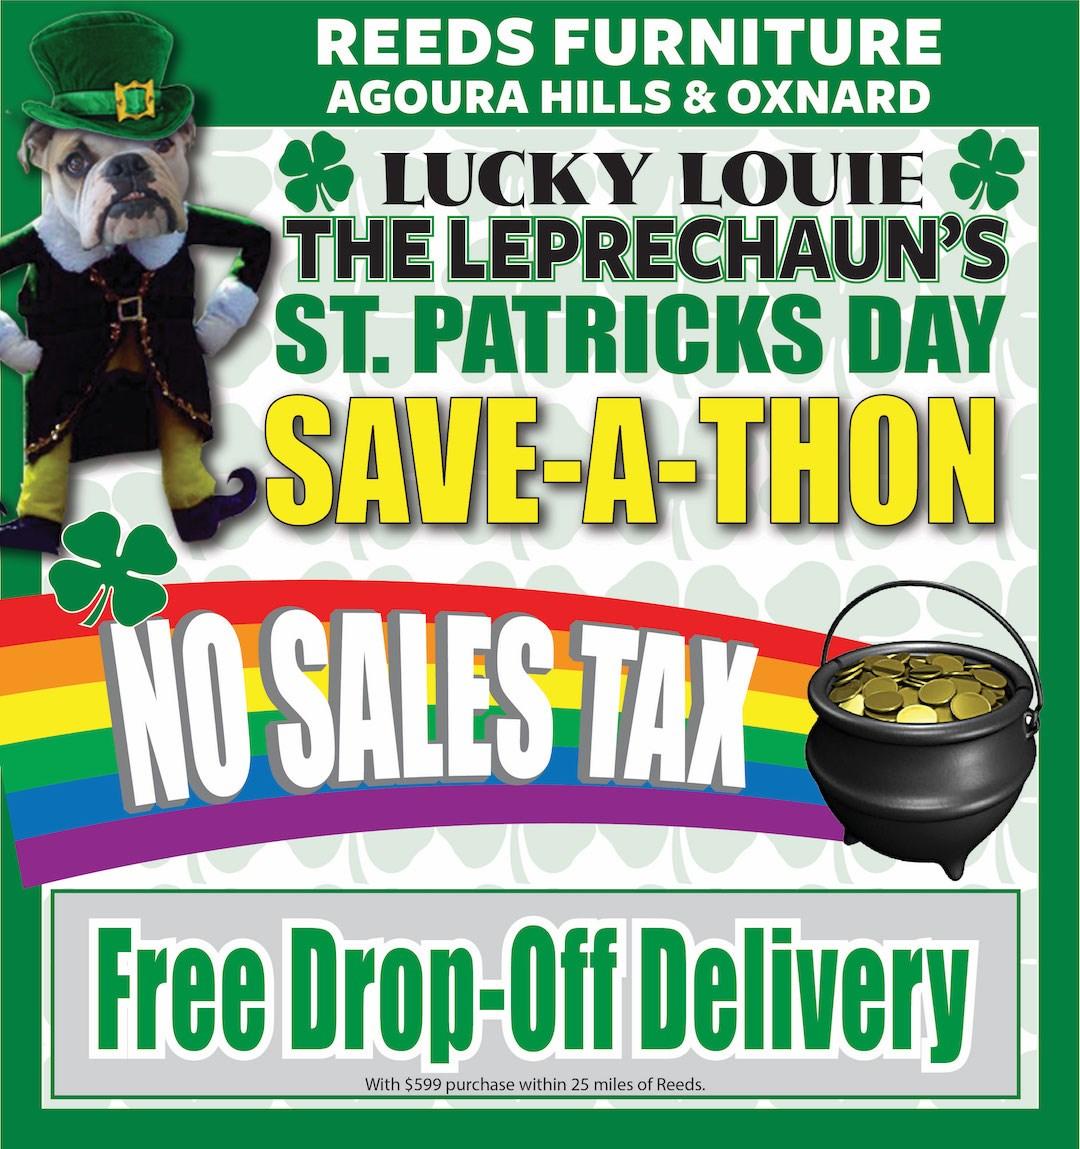 St. Patricks Day Save-A-Thon